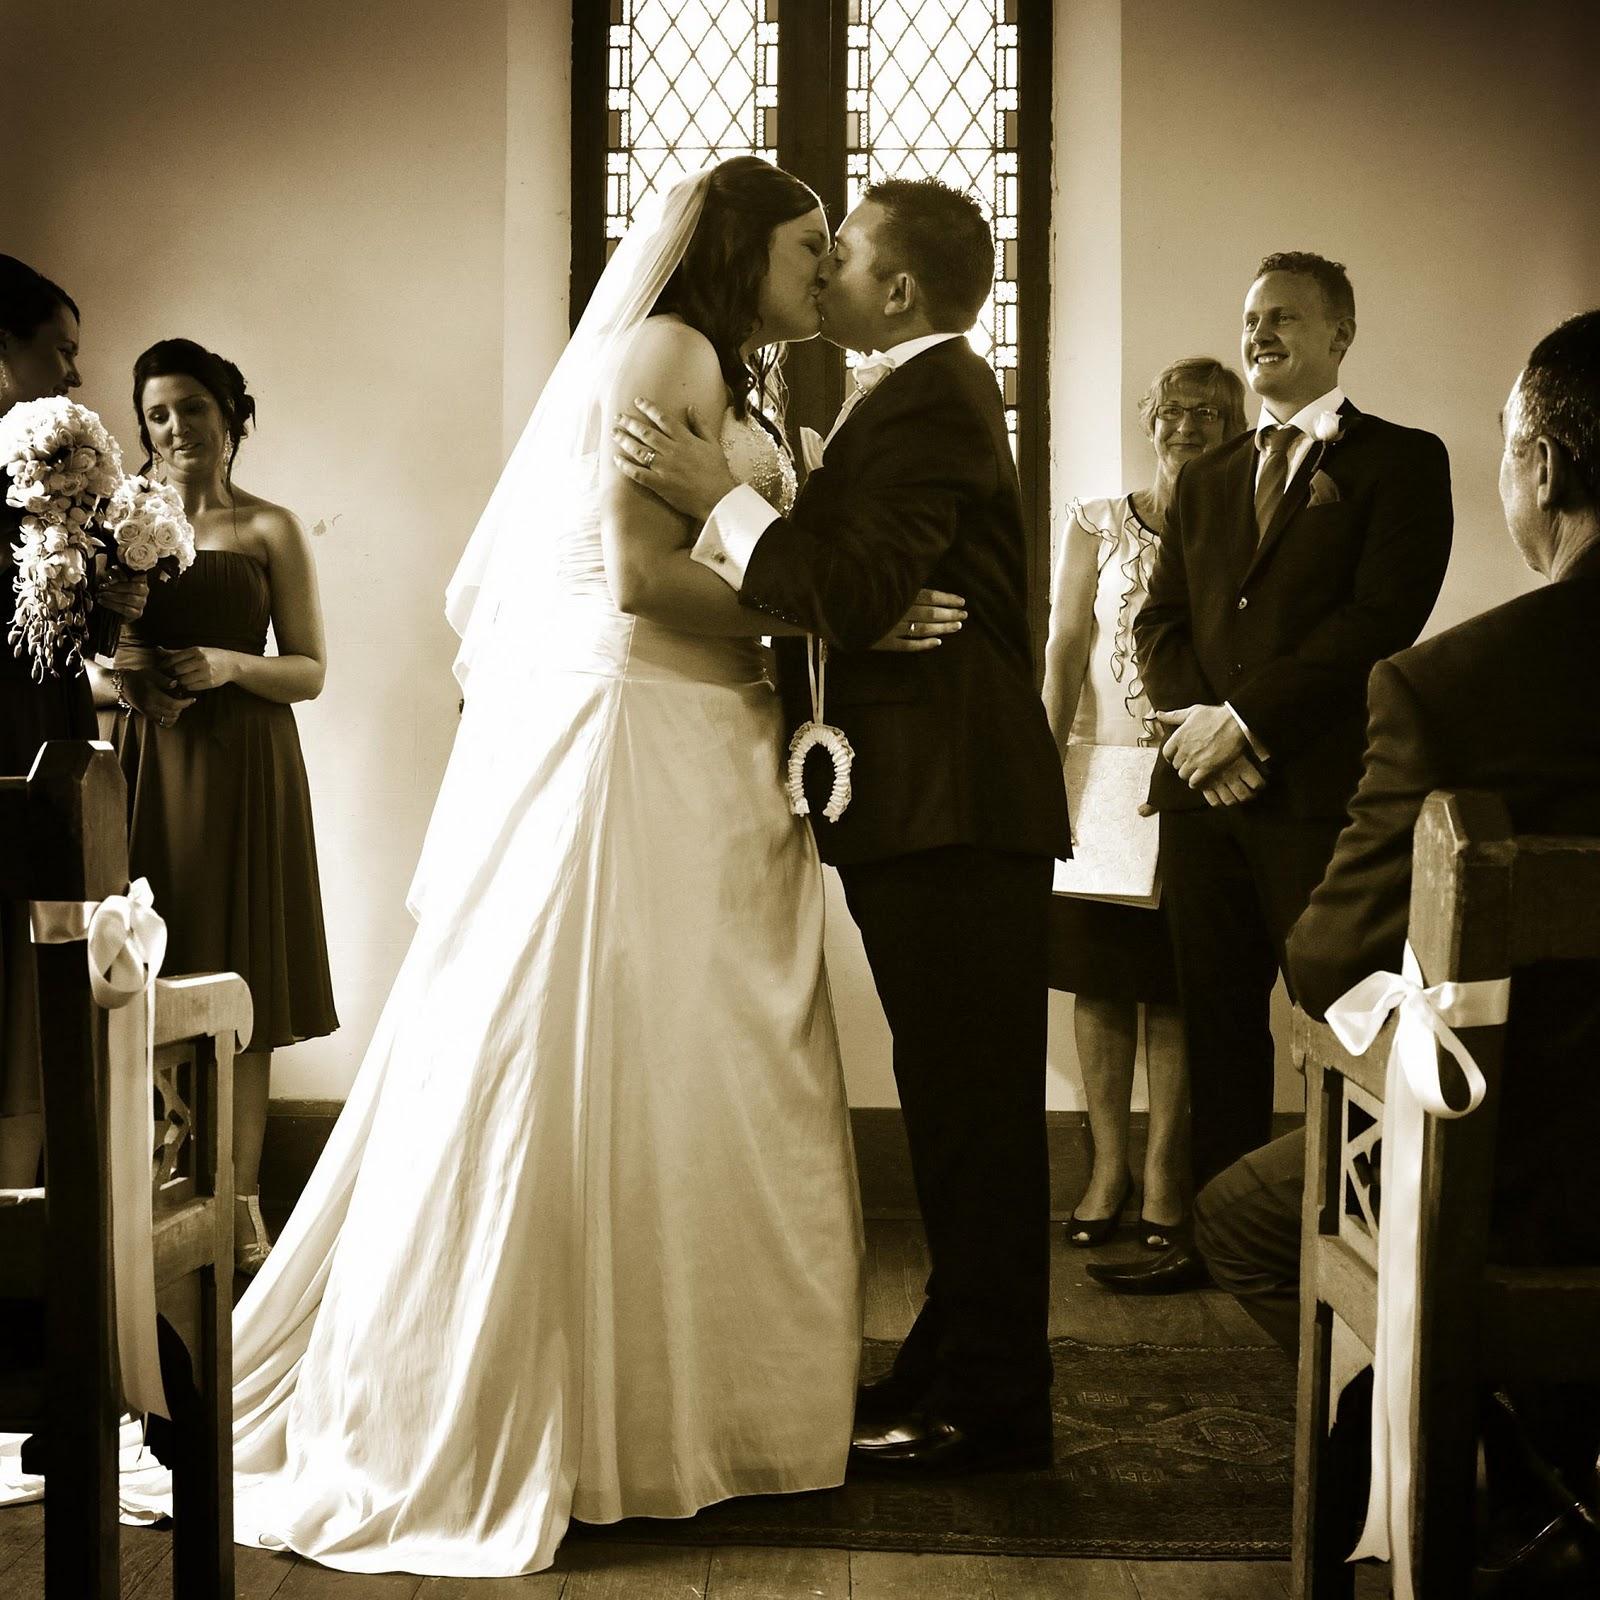 Bride Tasmania Blog: Real Life Weddings